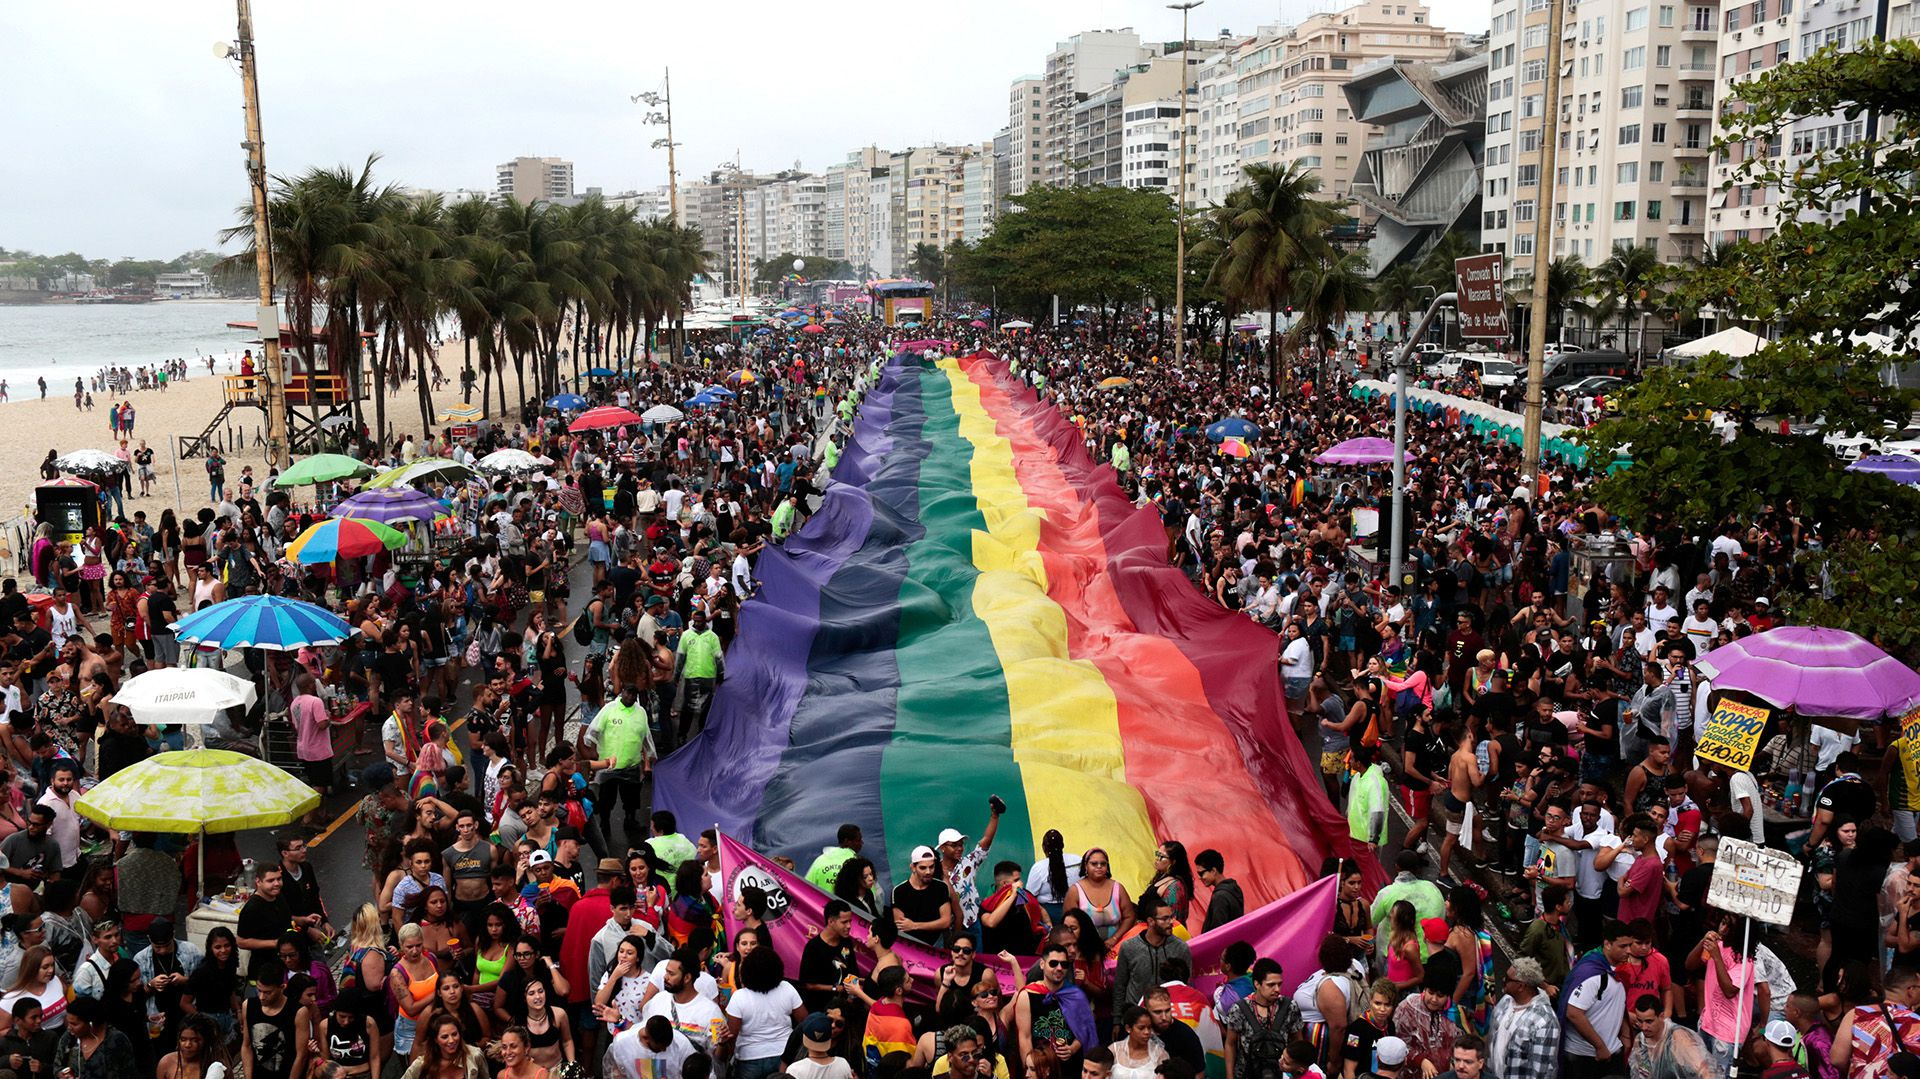 Beso de la censura: Orgullo Gay de Brasil dijo «¡Basta!» a Bolsonaro